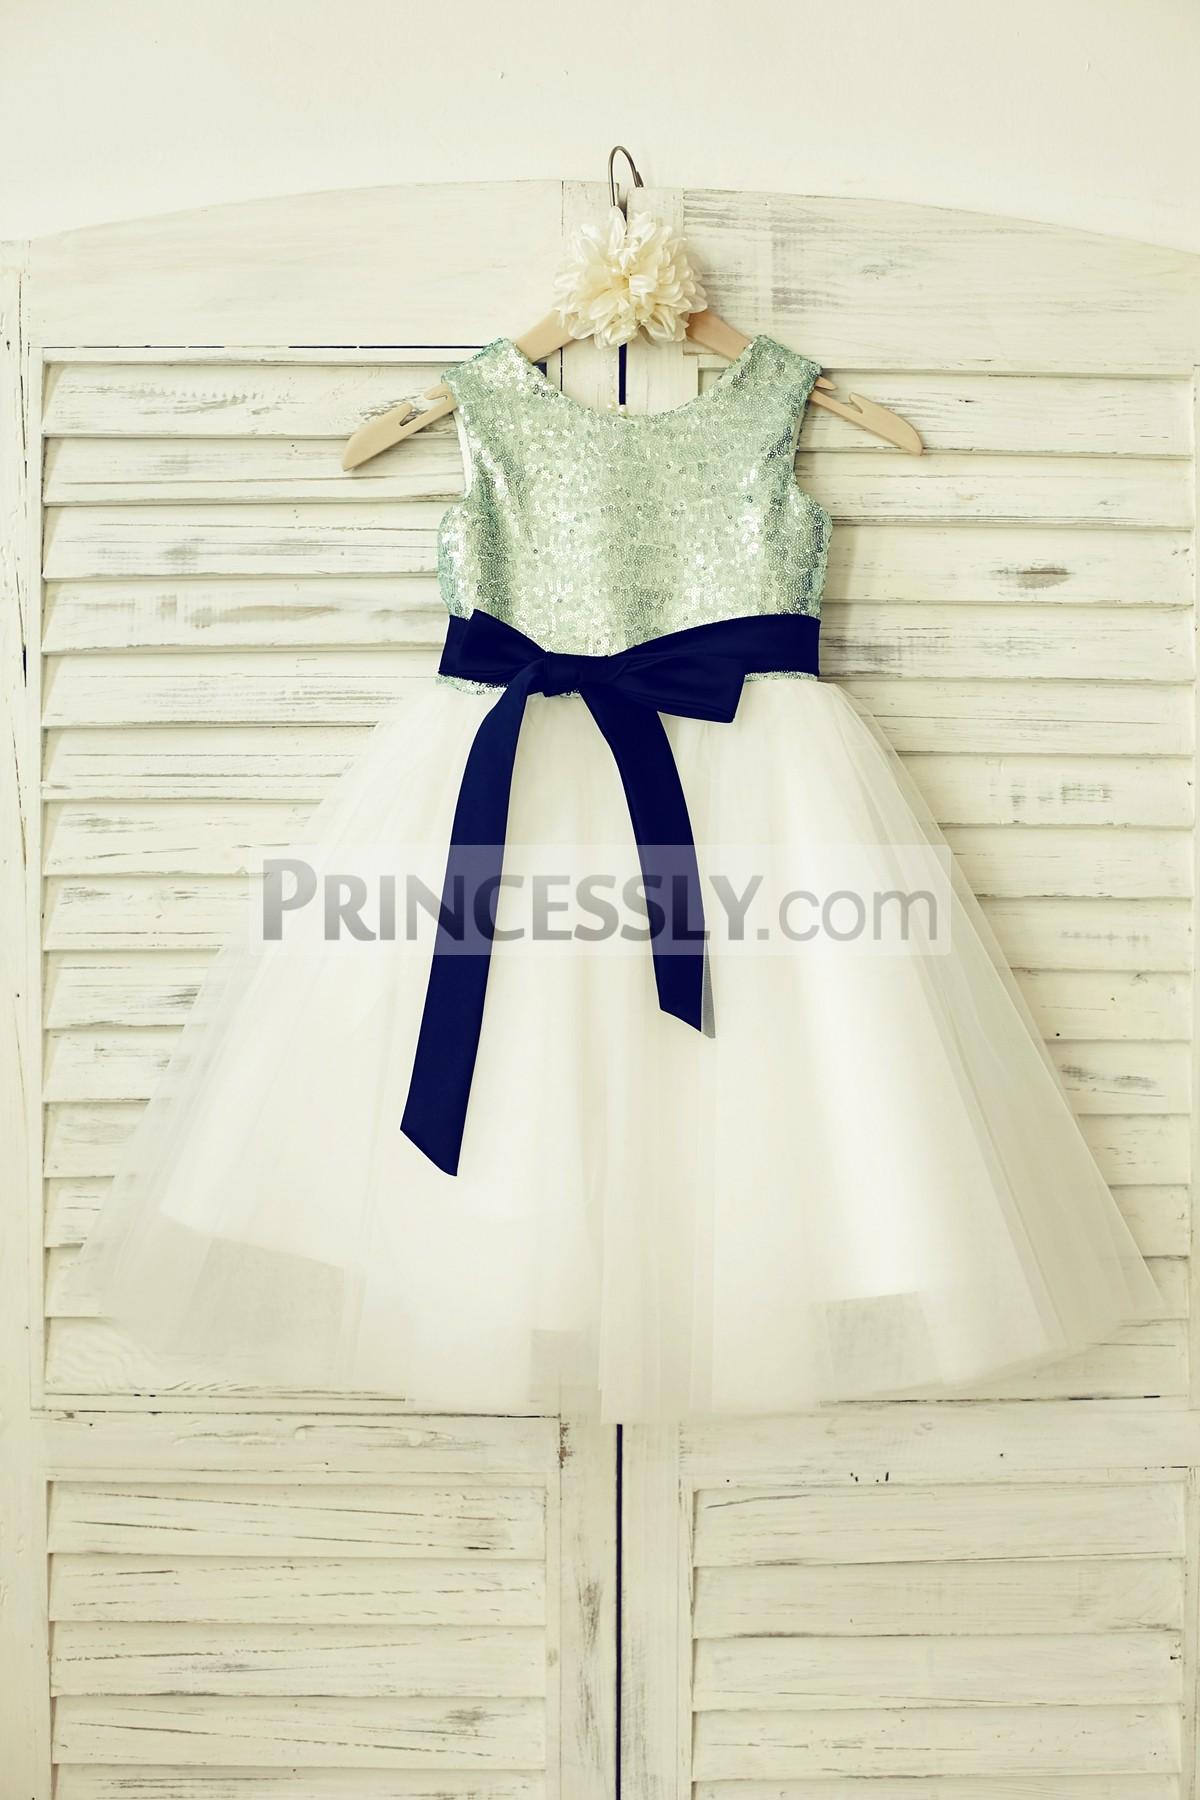 Princessly.com-K1000134-Mint Sequin Ivory Tulle Flower Girl Dress with navy blue sash-31